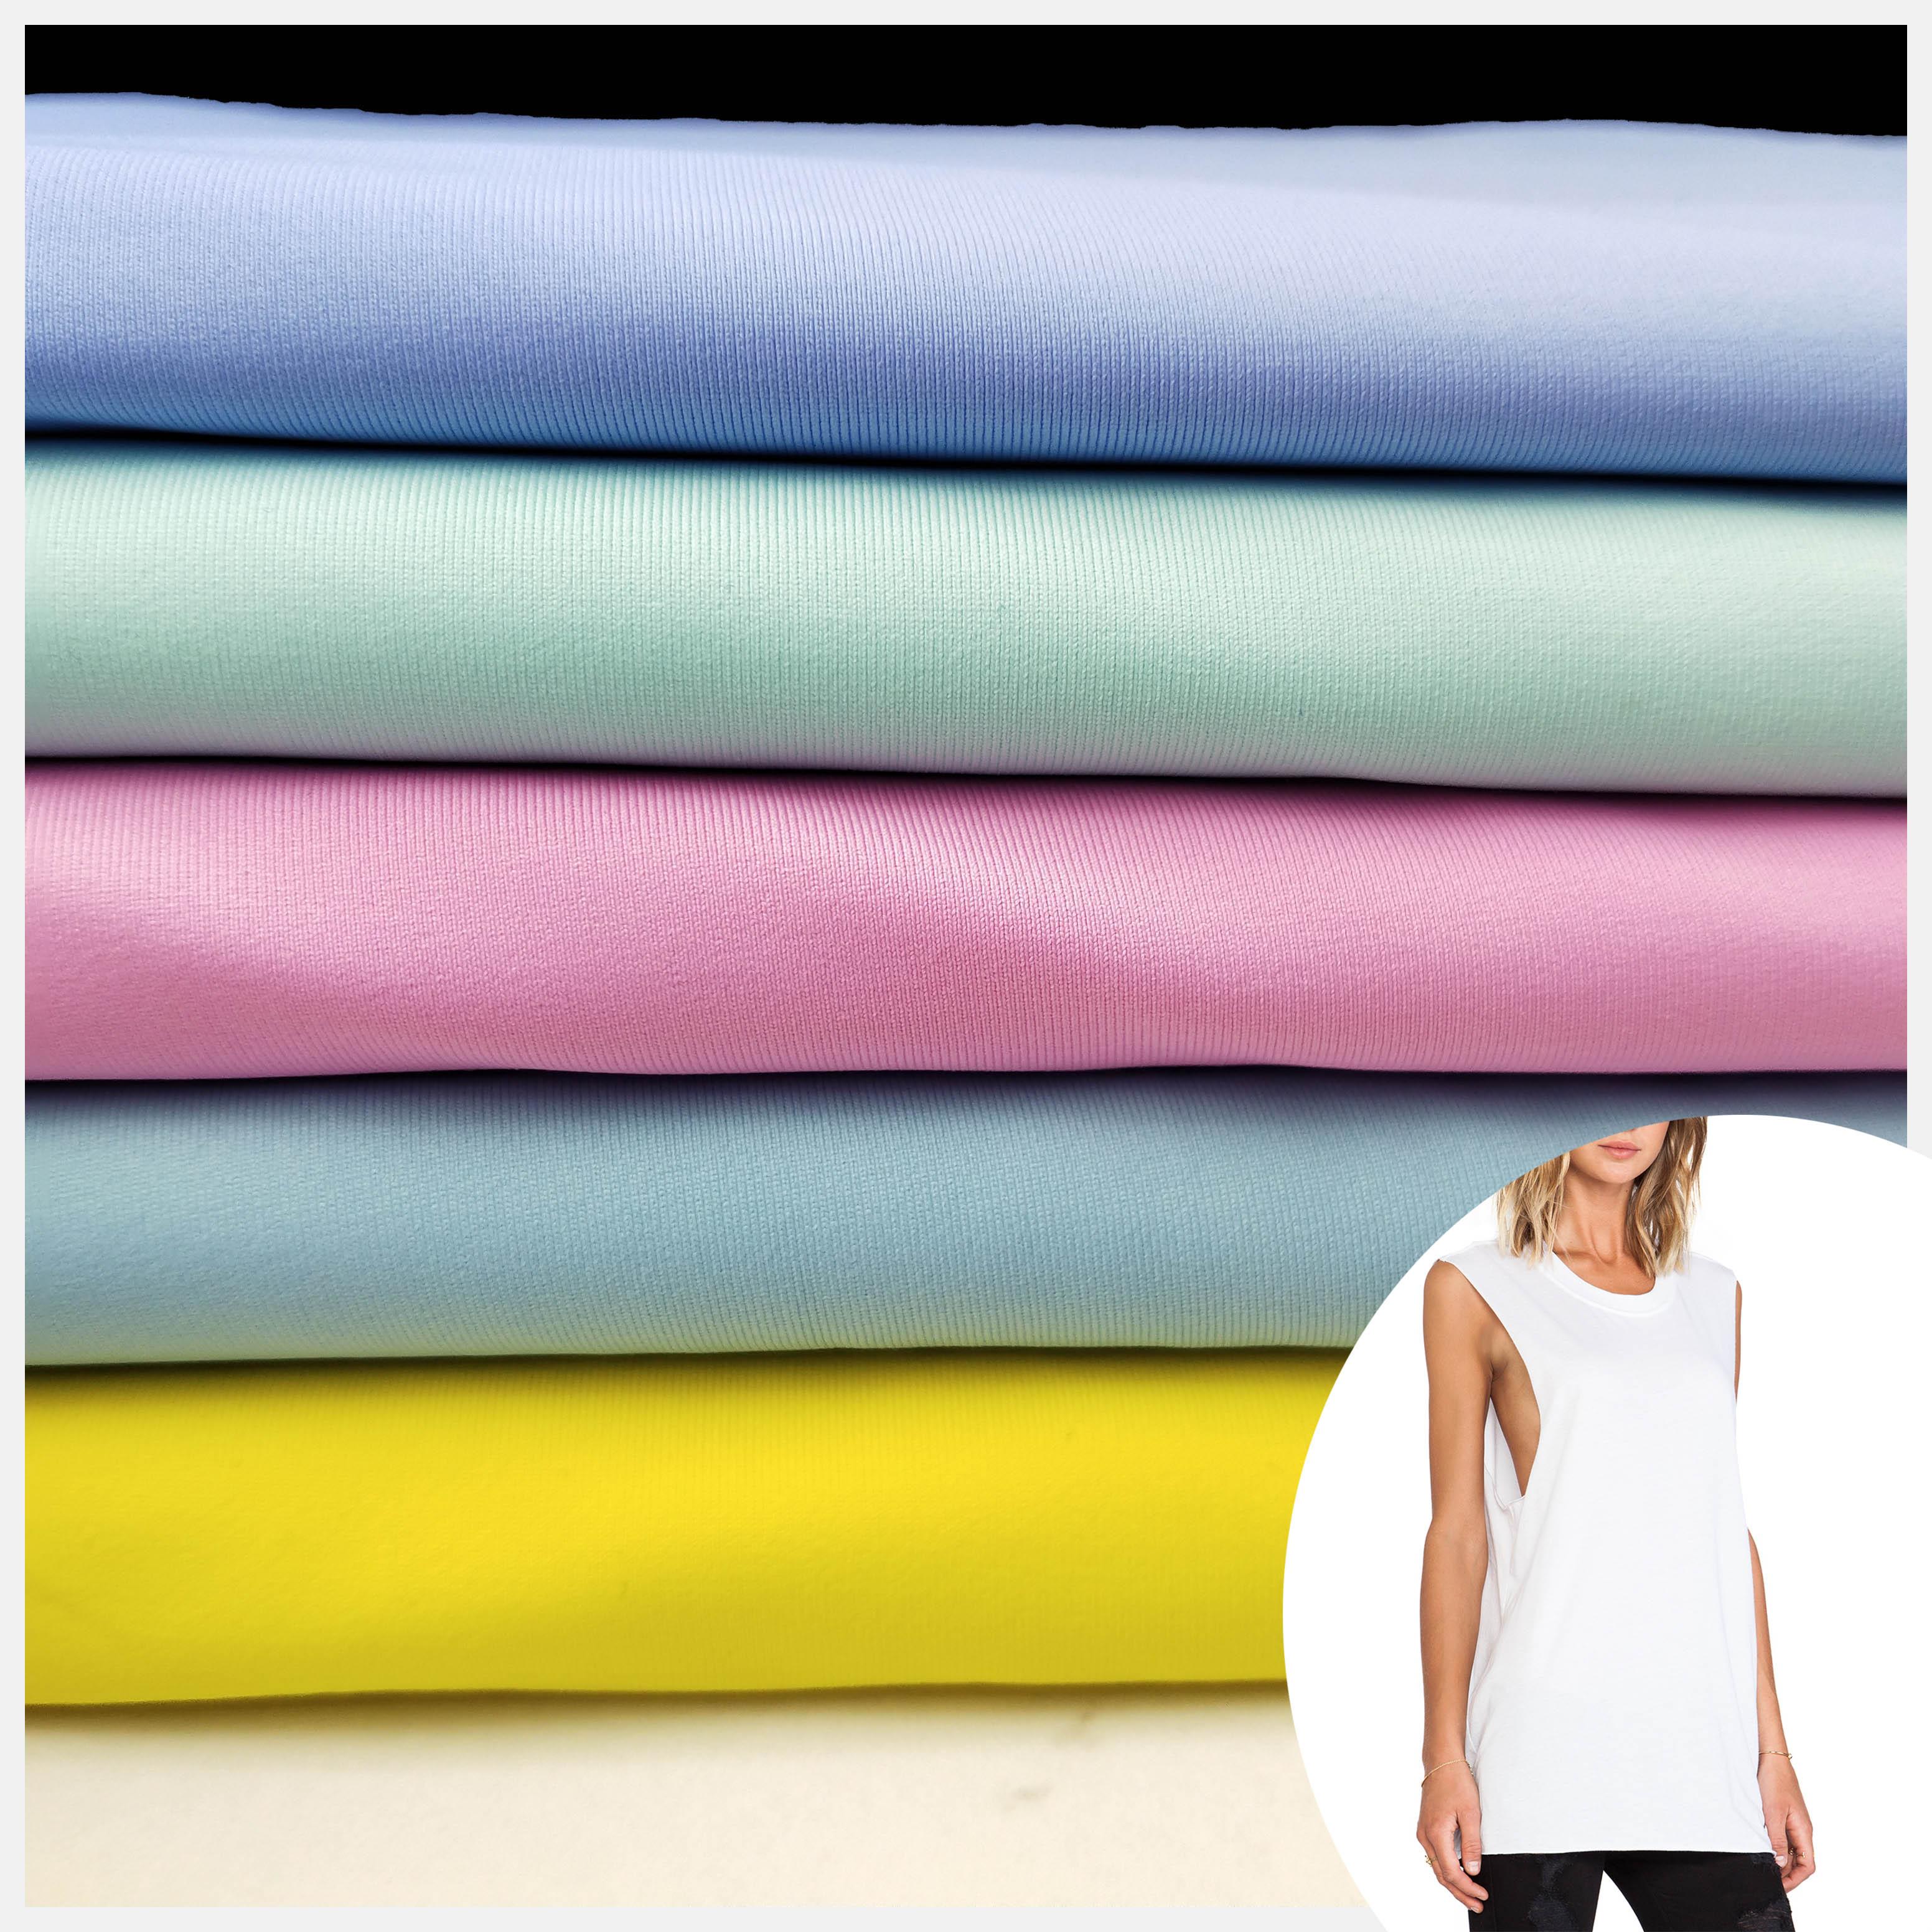 nylon jersey textile,1 Yard, Customized color